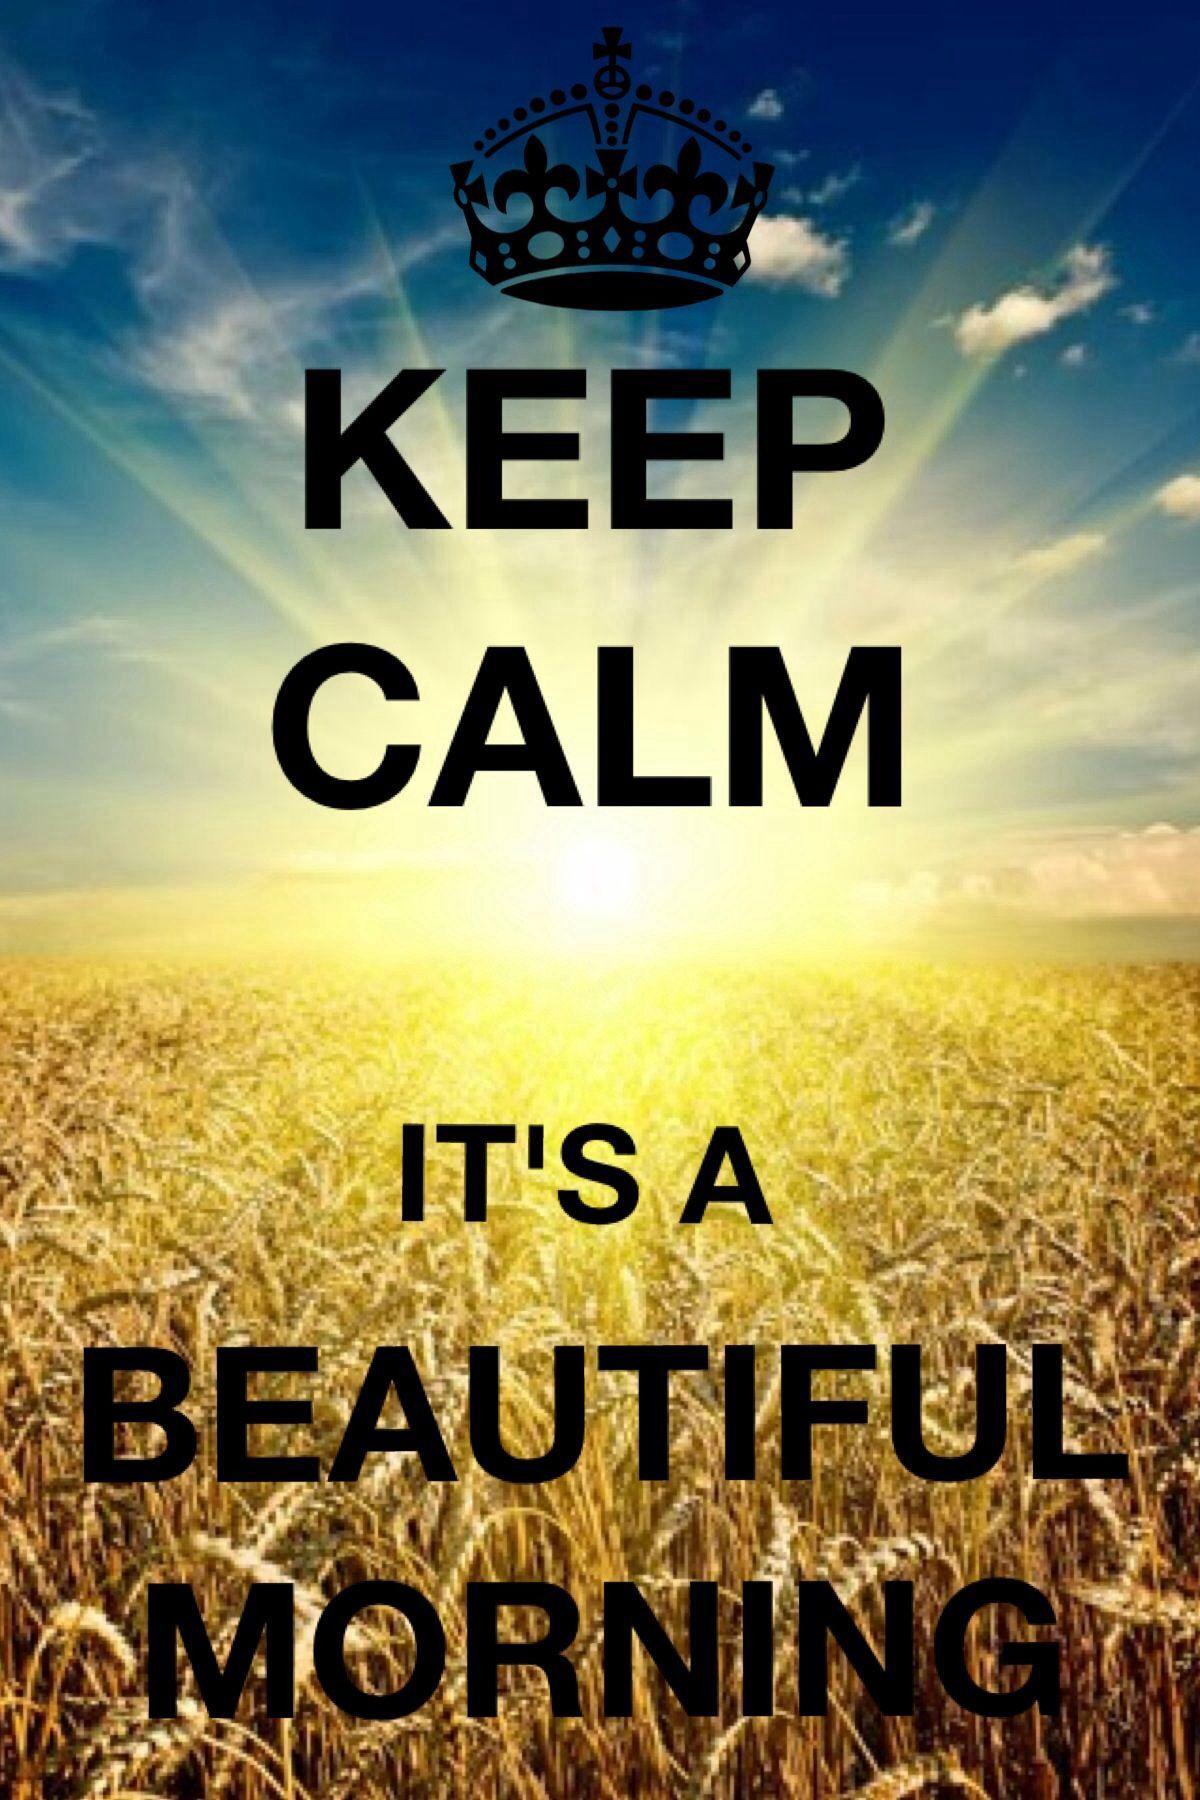 Keep Calm It's a Beautiful Morning!